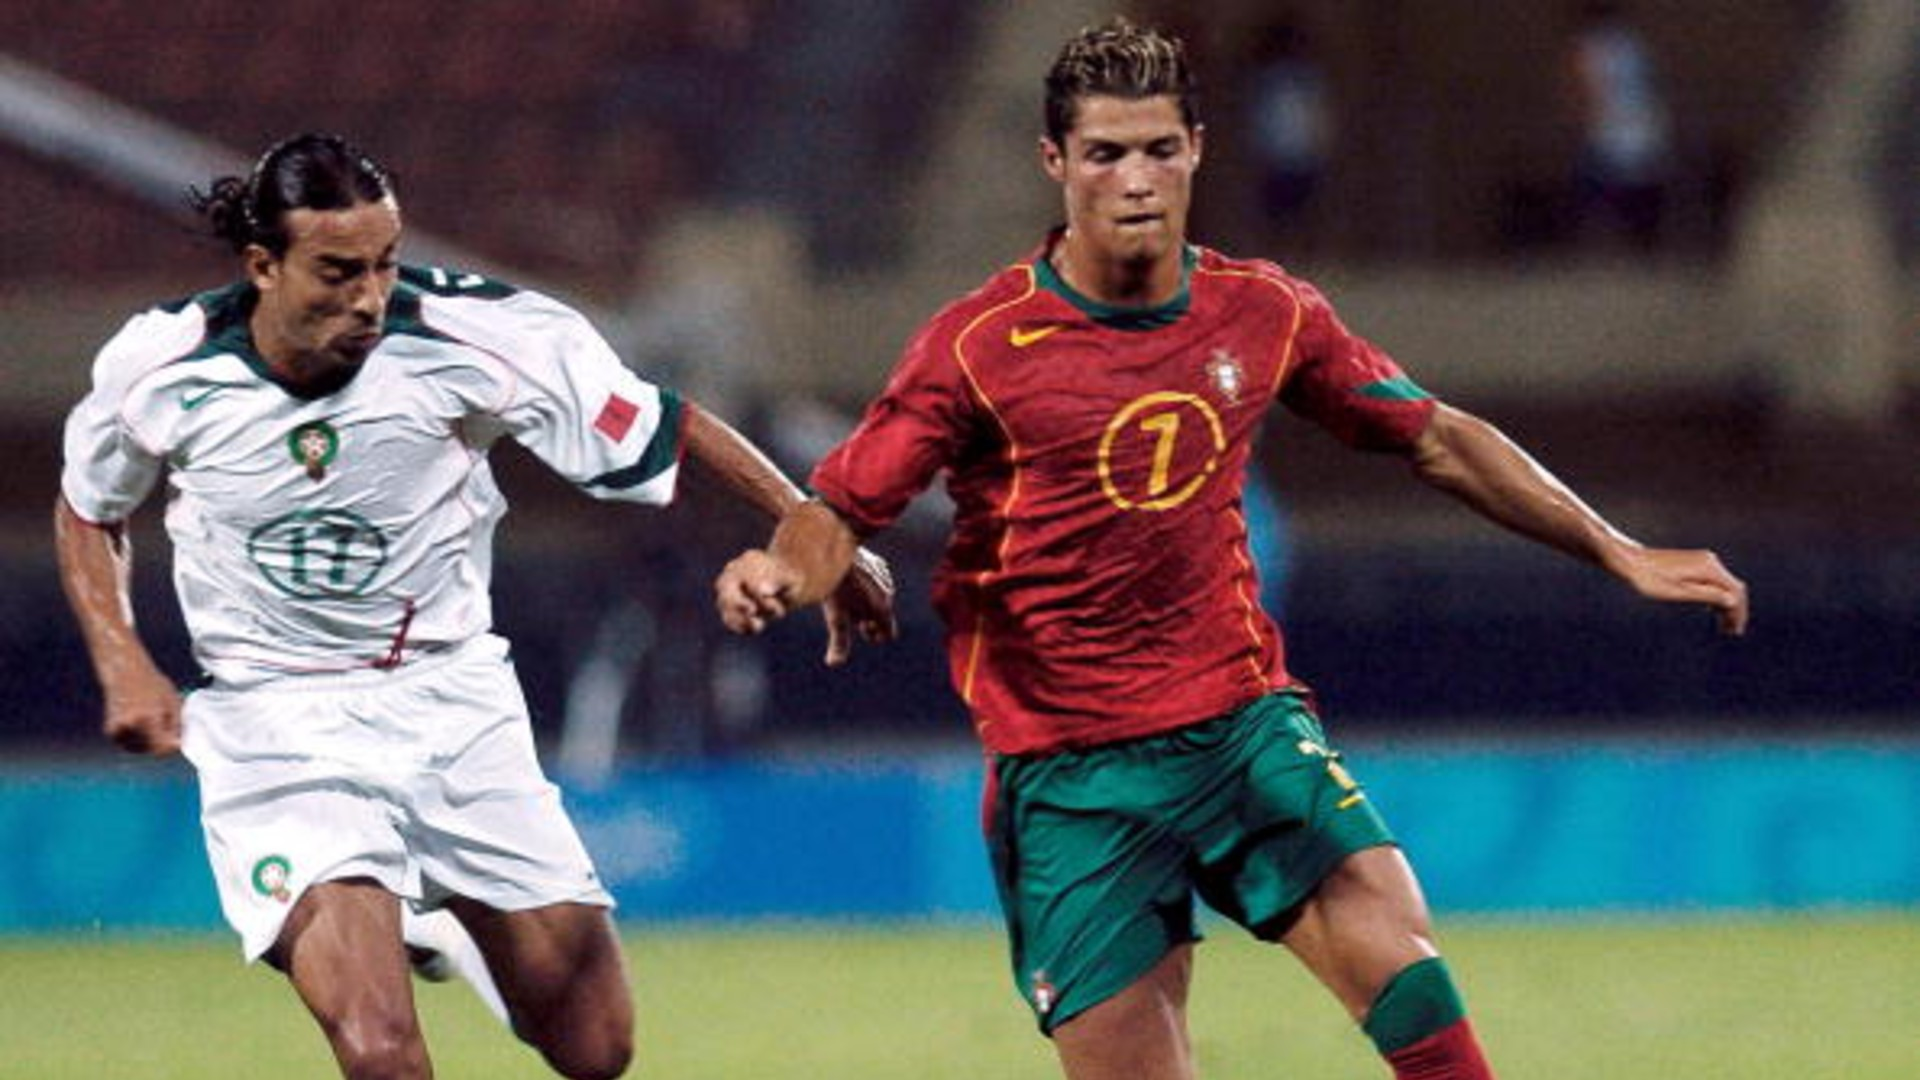 Where are Cristiano Ronaldo's 2004 Olympics Portugal teammates now?